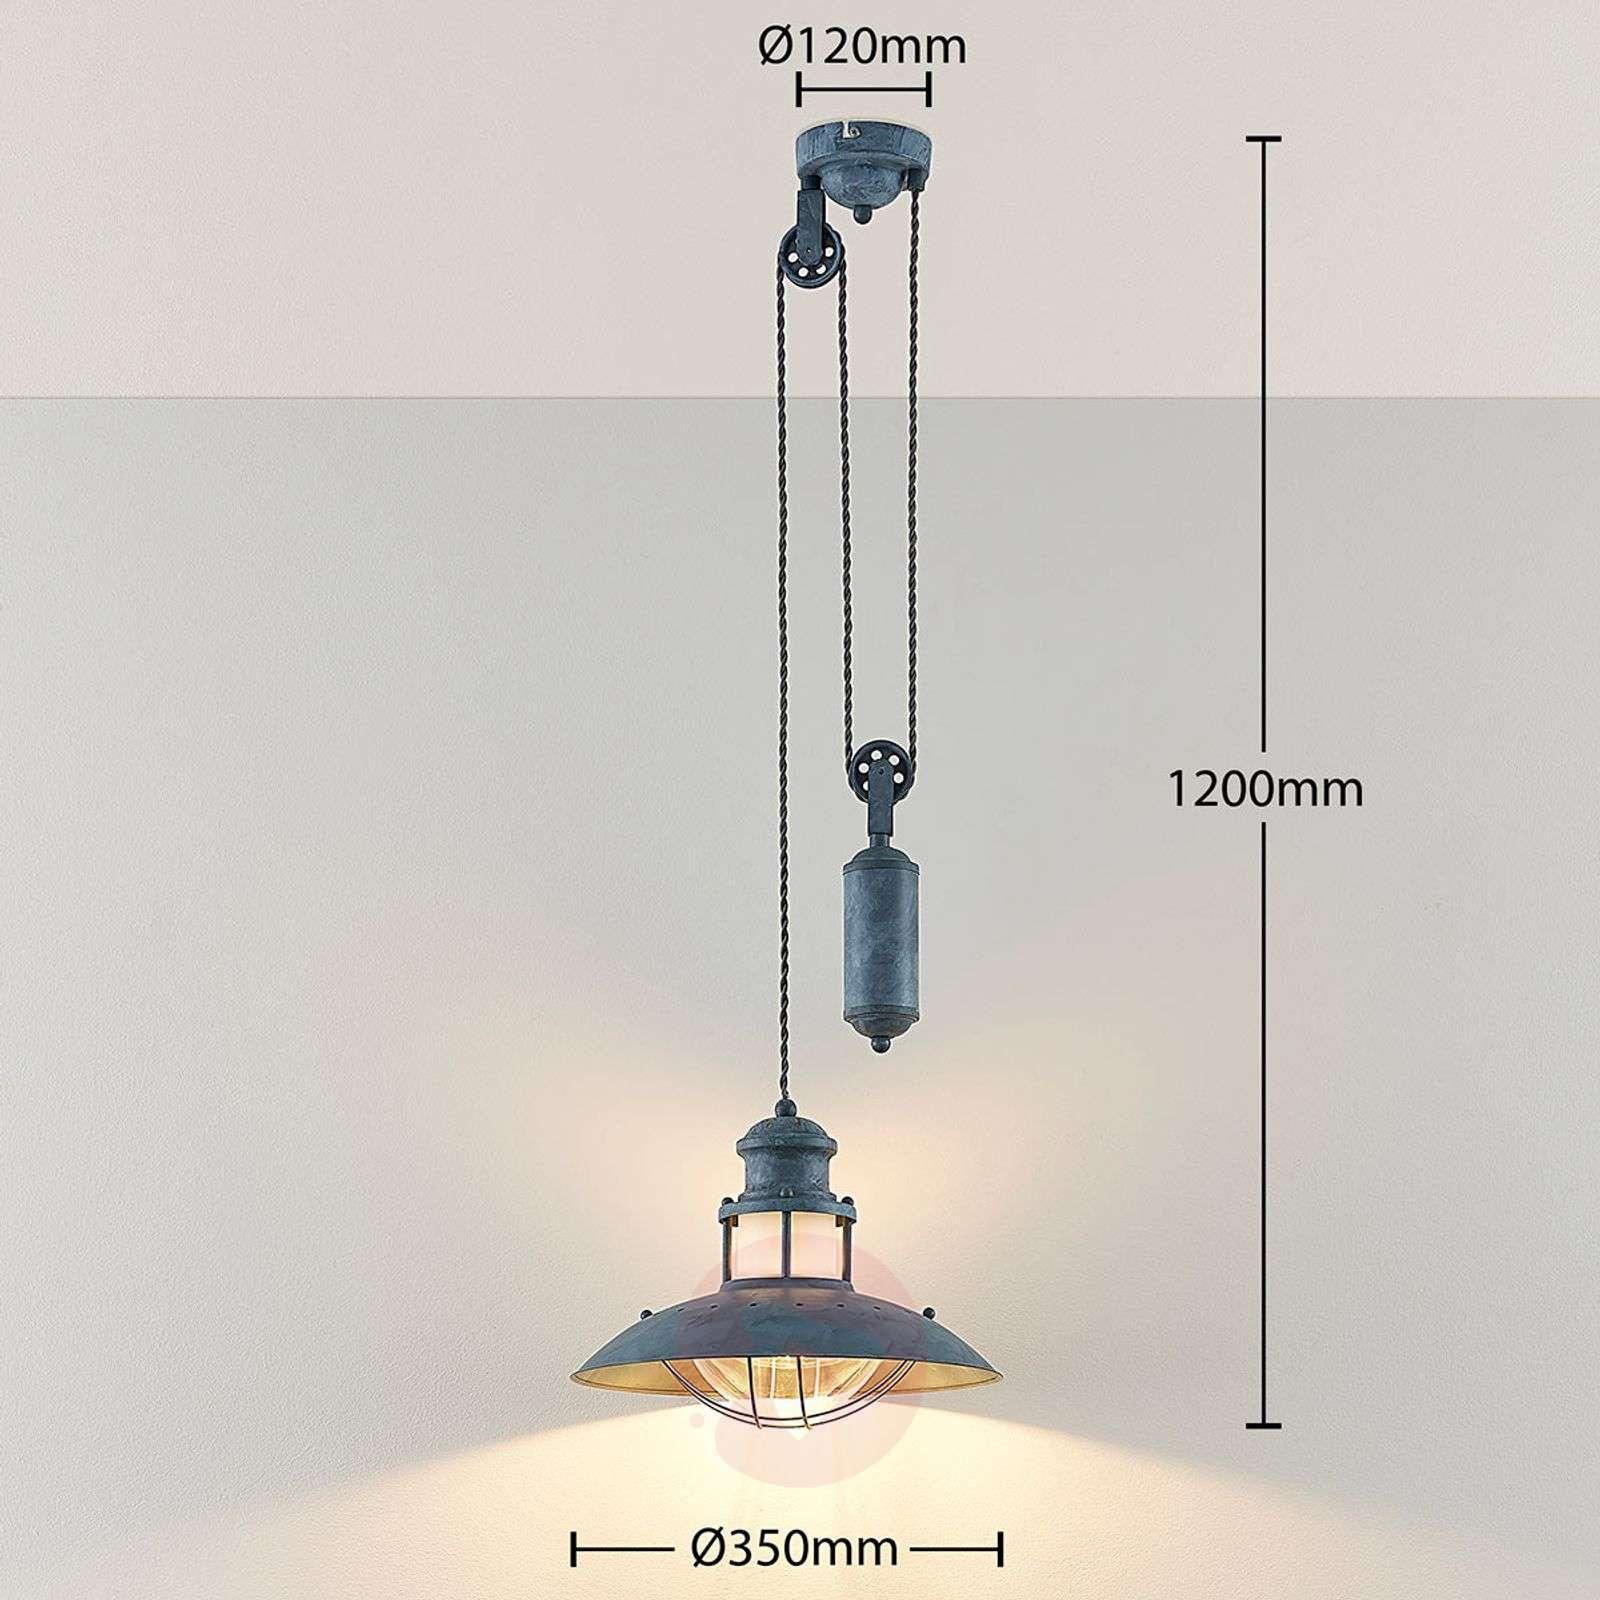 Louisanne hanging light with yo-yo pendulum-9621440-02